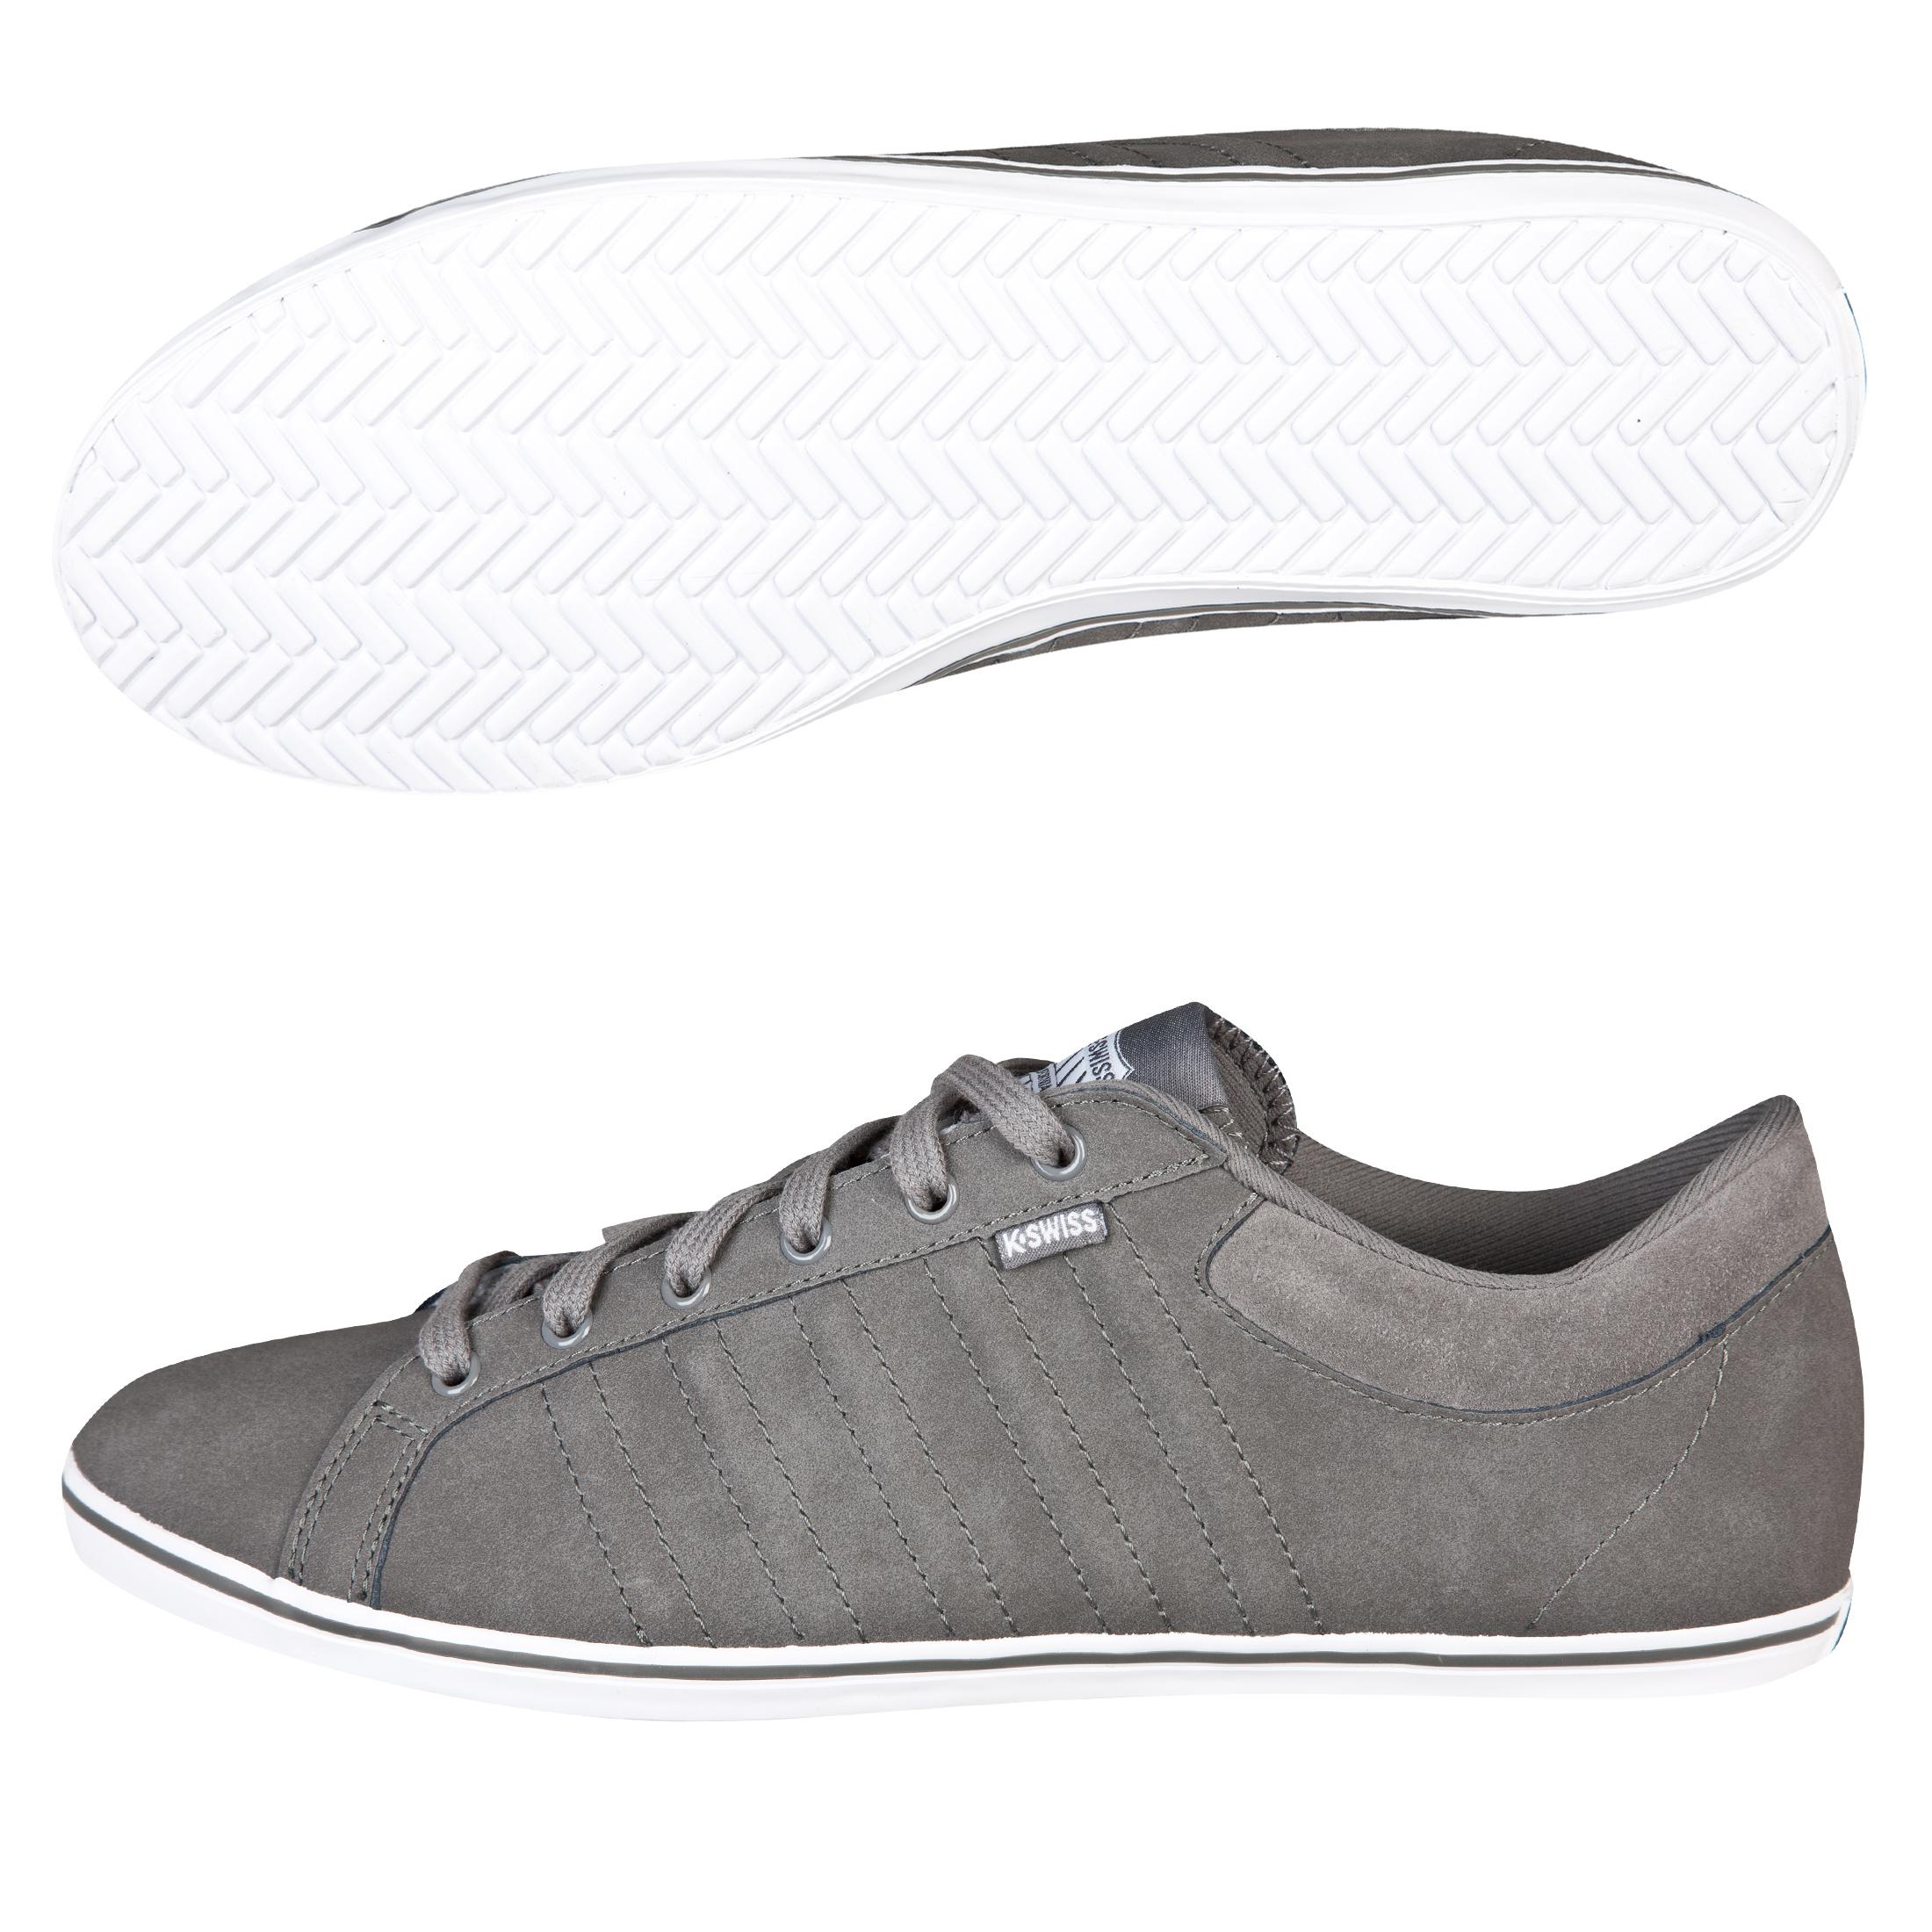 K Swiss K-Swiss Hof IV Plimsol - Carbon Grey/White